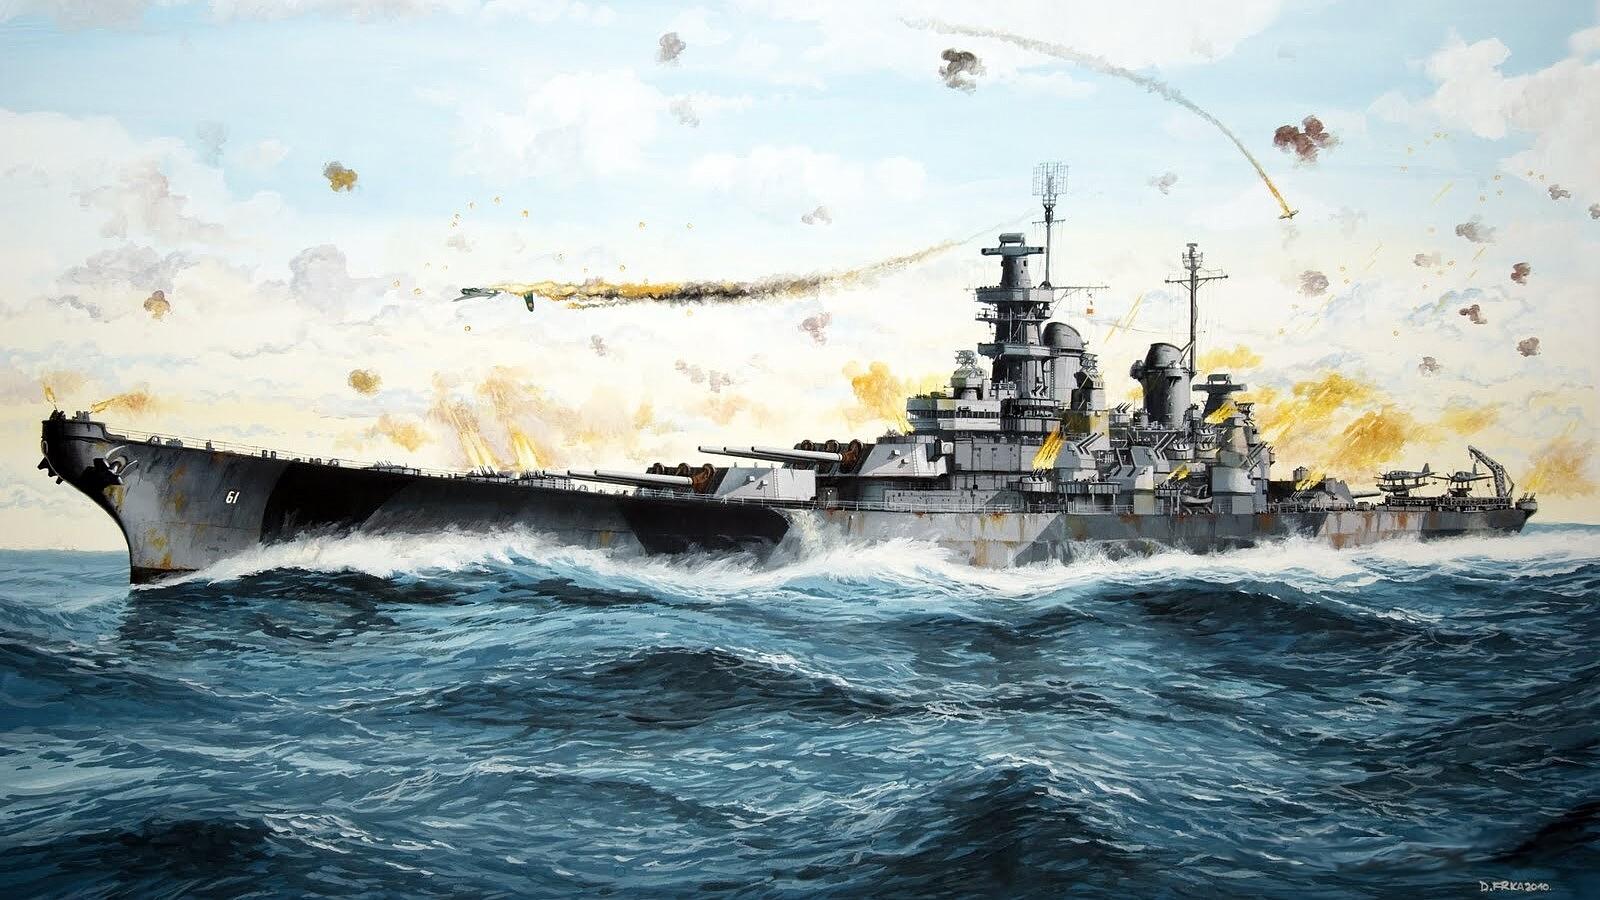 USS Iowa BB 61 Wallpaper and Background Image 1600x900 ID 1600x900